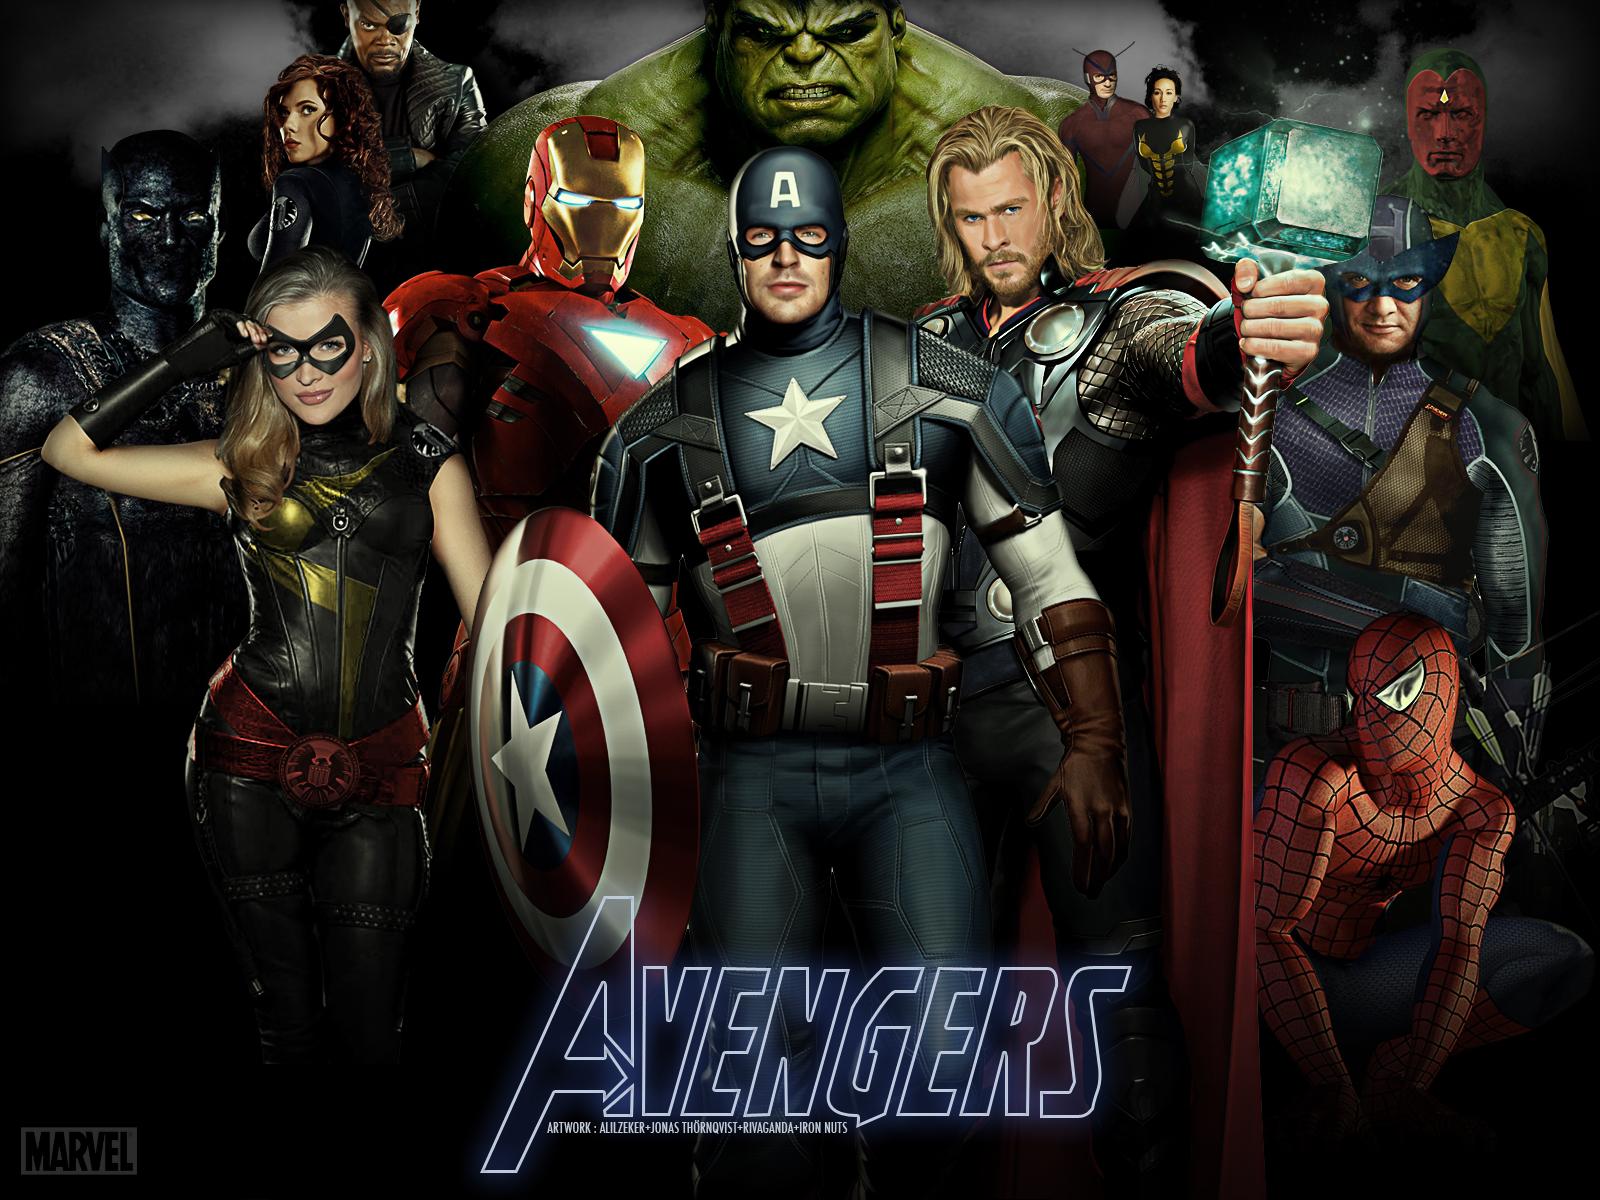 http://2.bp.blogspot.com/-6OJ__dVvCwA/T__V-wMQC1I/AAAAAAAAAO4/PVafe0ccuvY/s1600/The-Avengers+(yasir-amin.blogspot.com).jpg